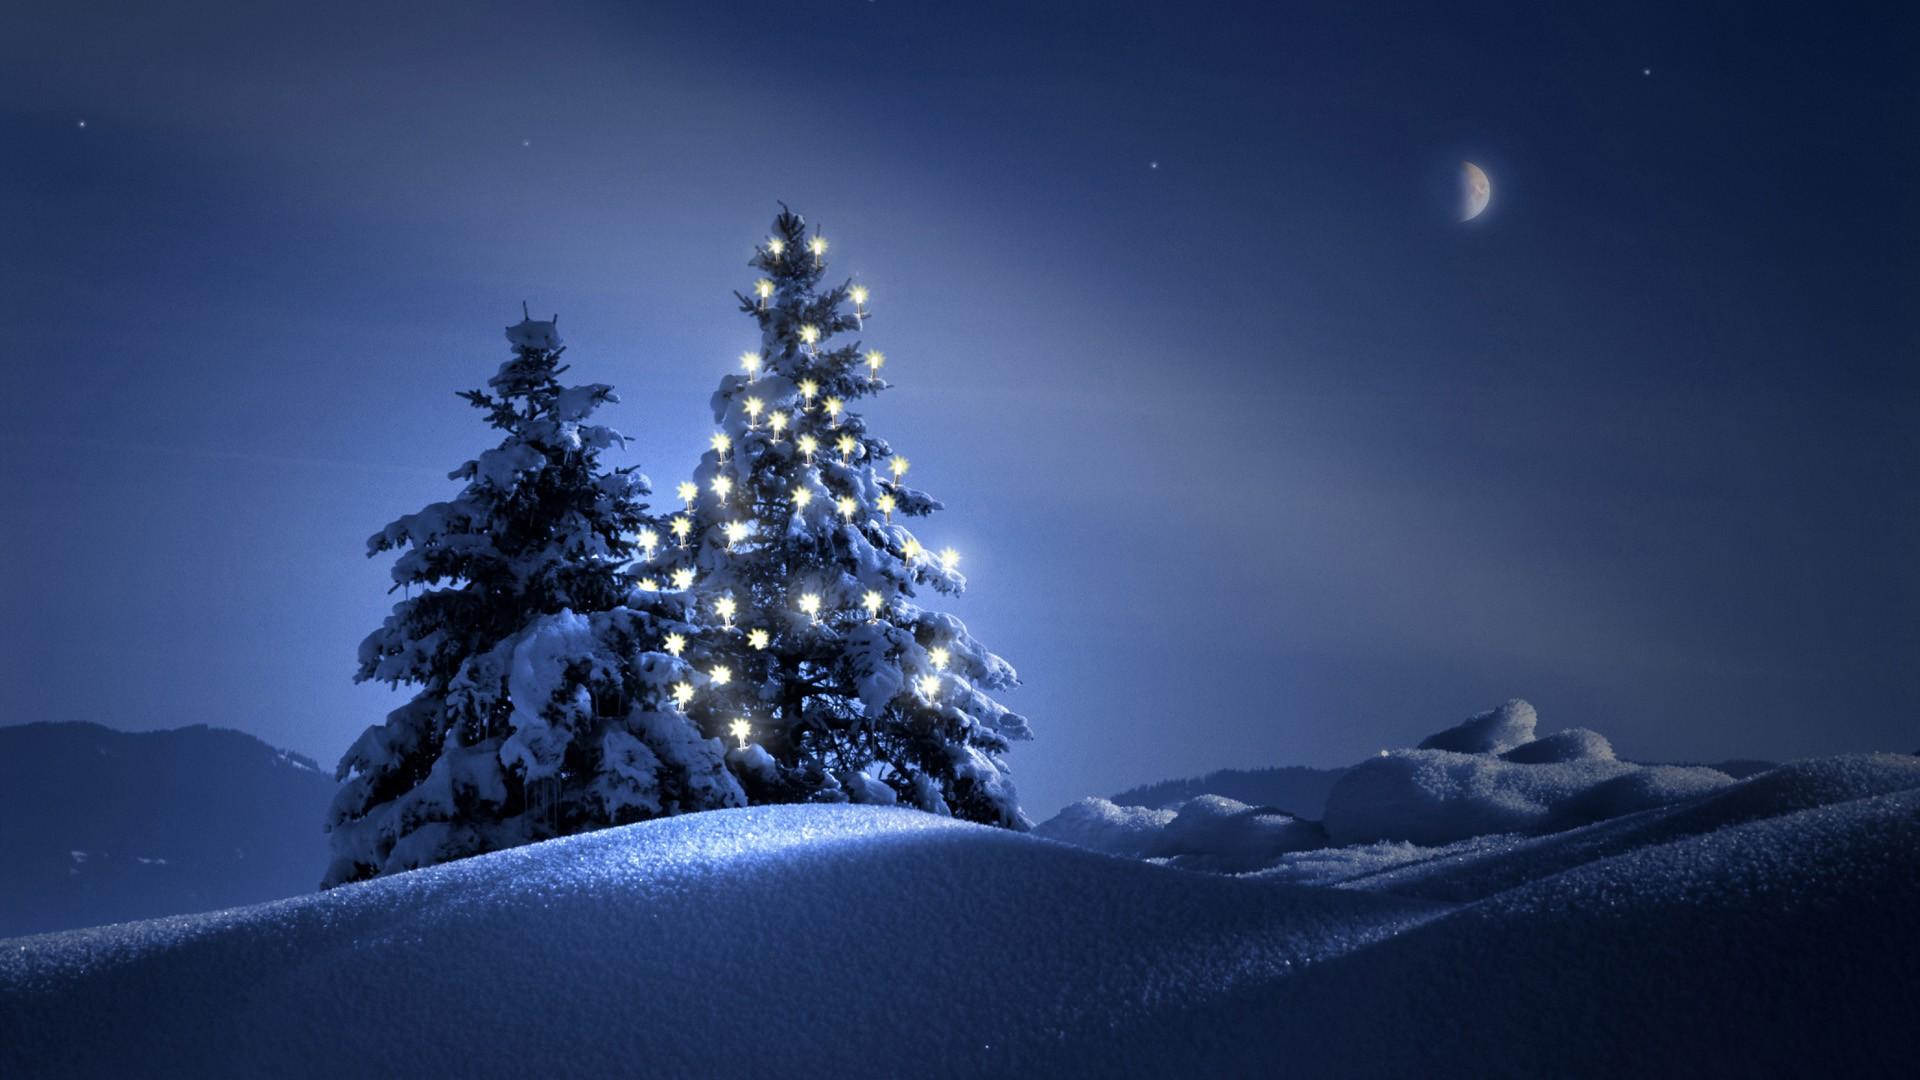 Christmas Tree On Snow Wallpaper Wide Wallpaper WallpaperLepi 1920x1080